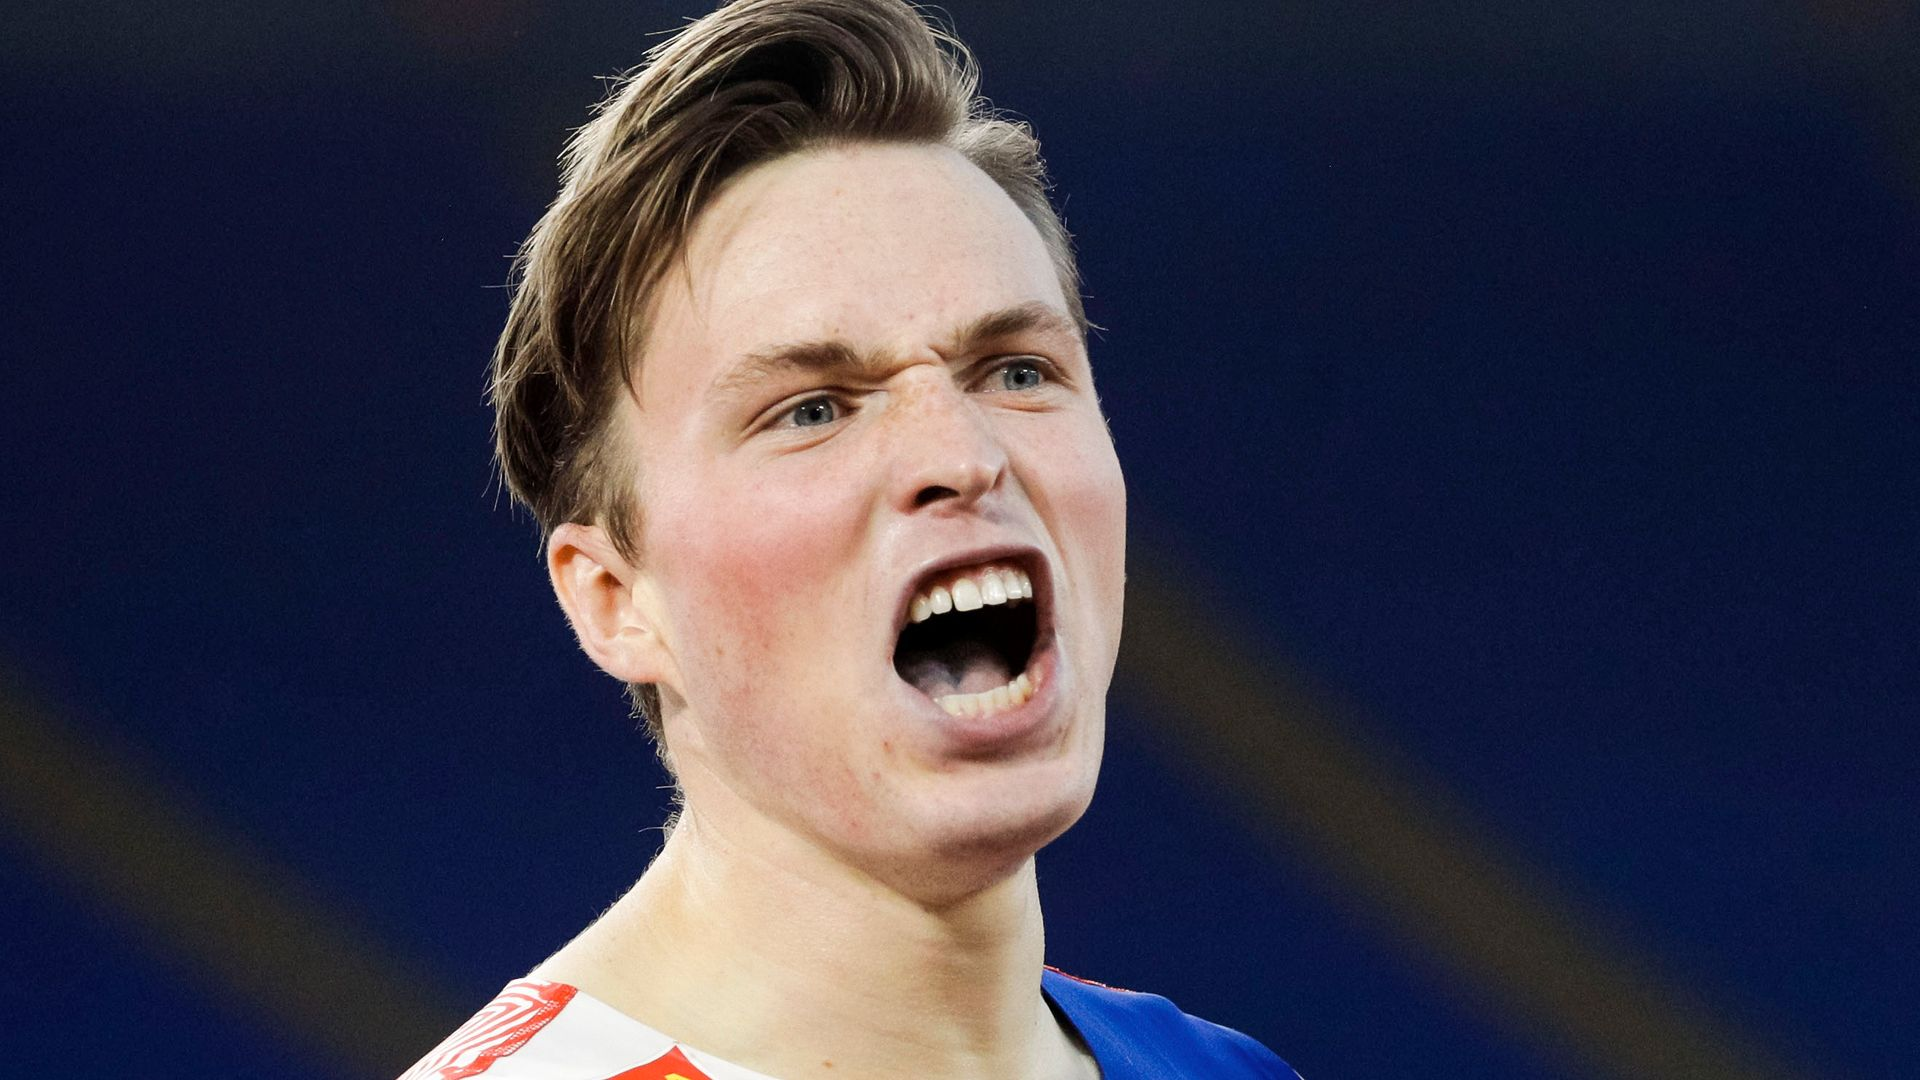 Warholm breaks long-standing 400m hurdles world record